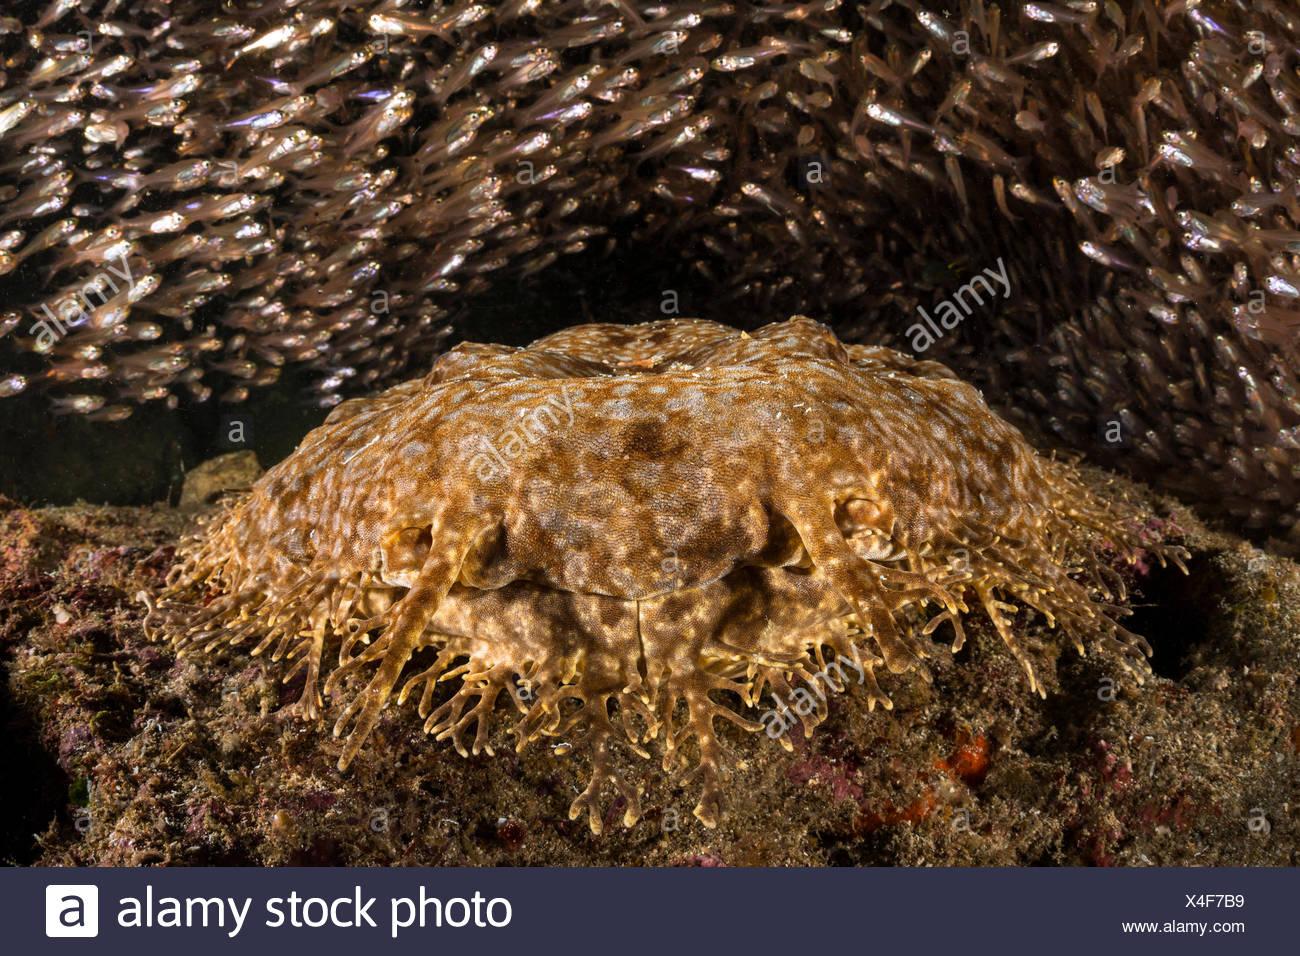 Tasselled Wobbegong surrounded by Pygmy Sweepers, Eucrossorhinus dasypogon, Waigeo, Raja Ampat, Indonesia - Stock Image